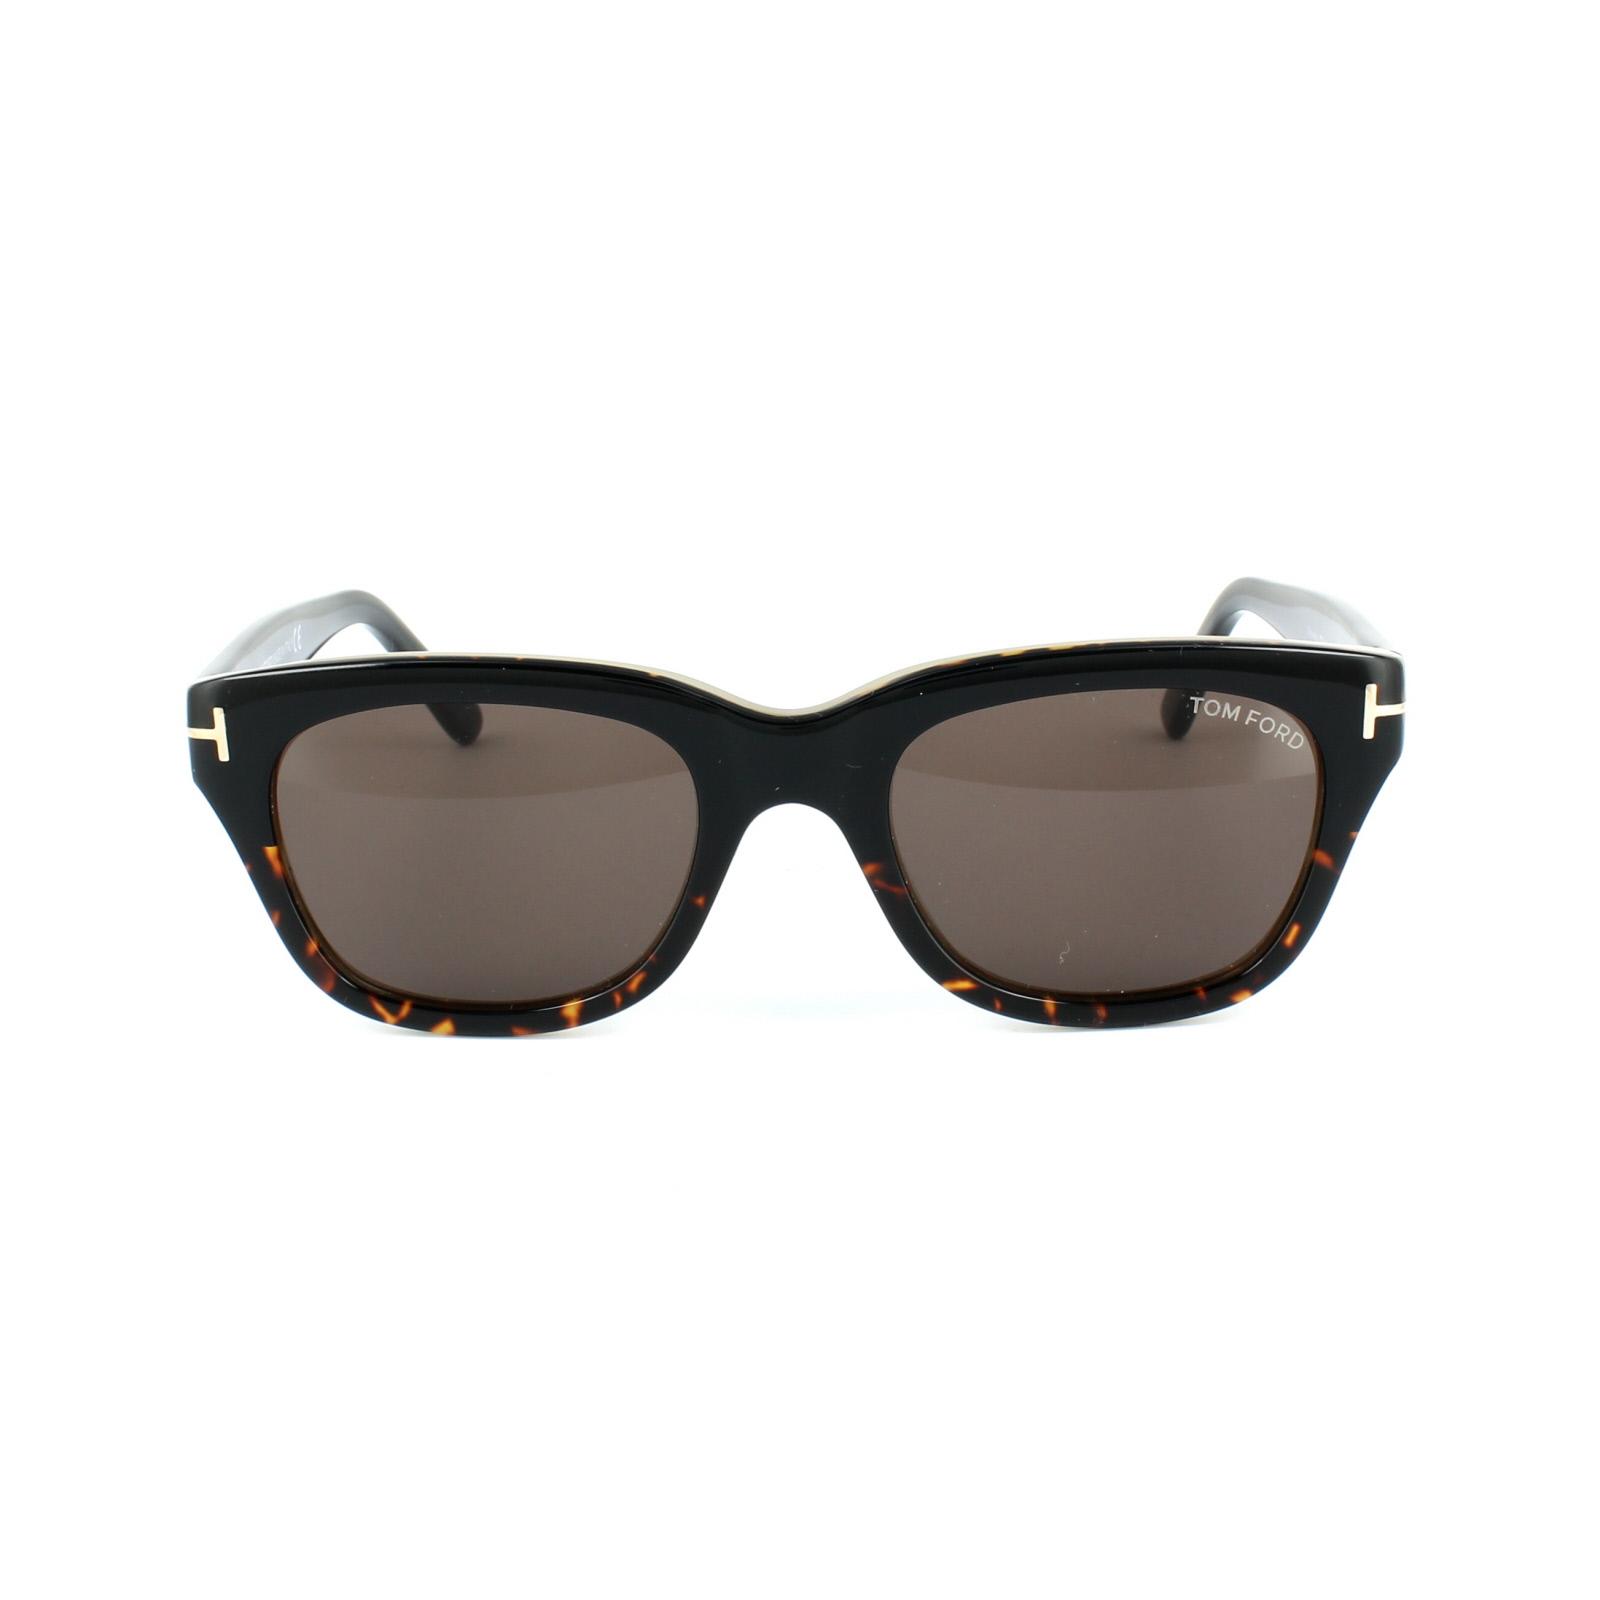 c97ba942ce Sentinel Tom Ford Sunglasses 0237 Snowdon 05J Black   Havana Roviex Grey  Brown 52mm